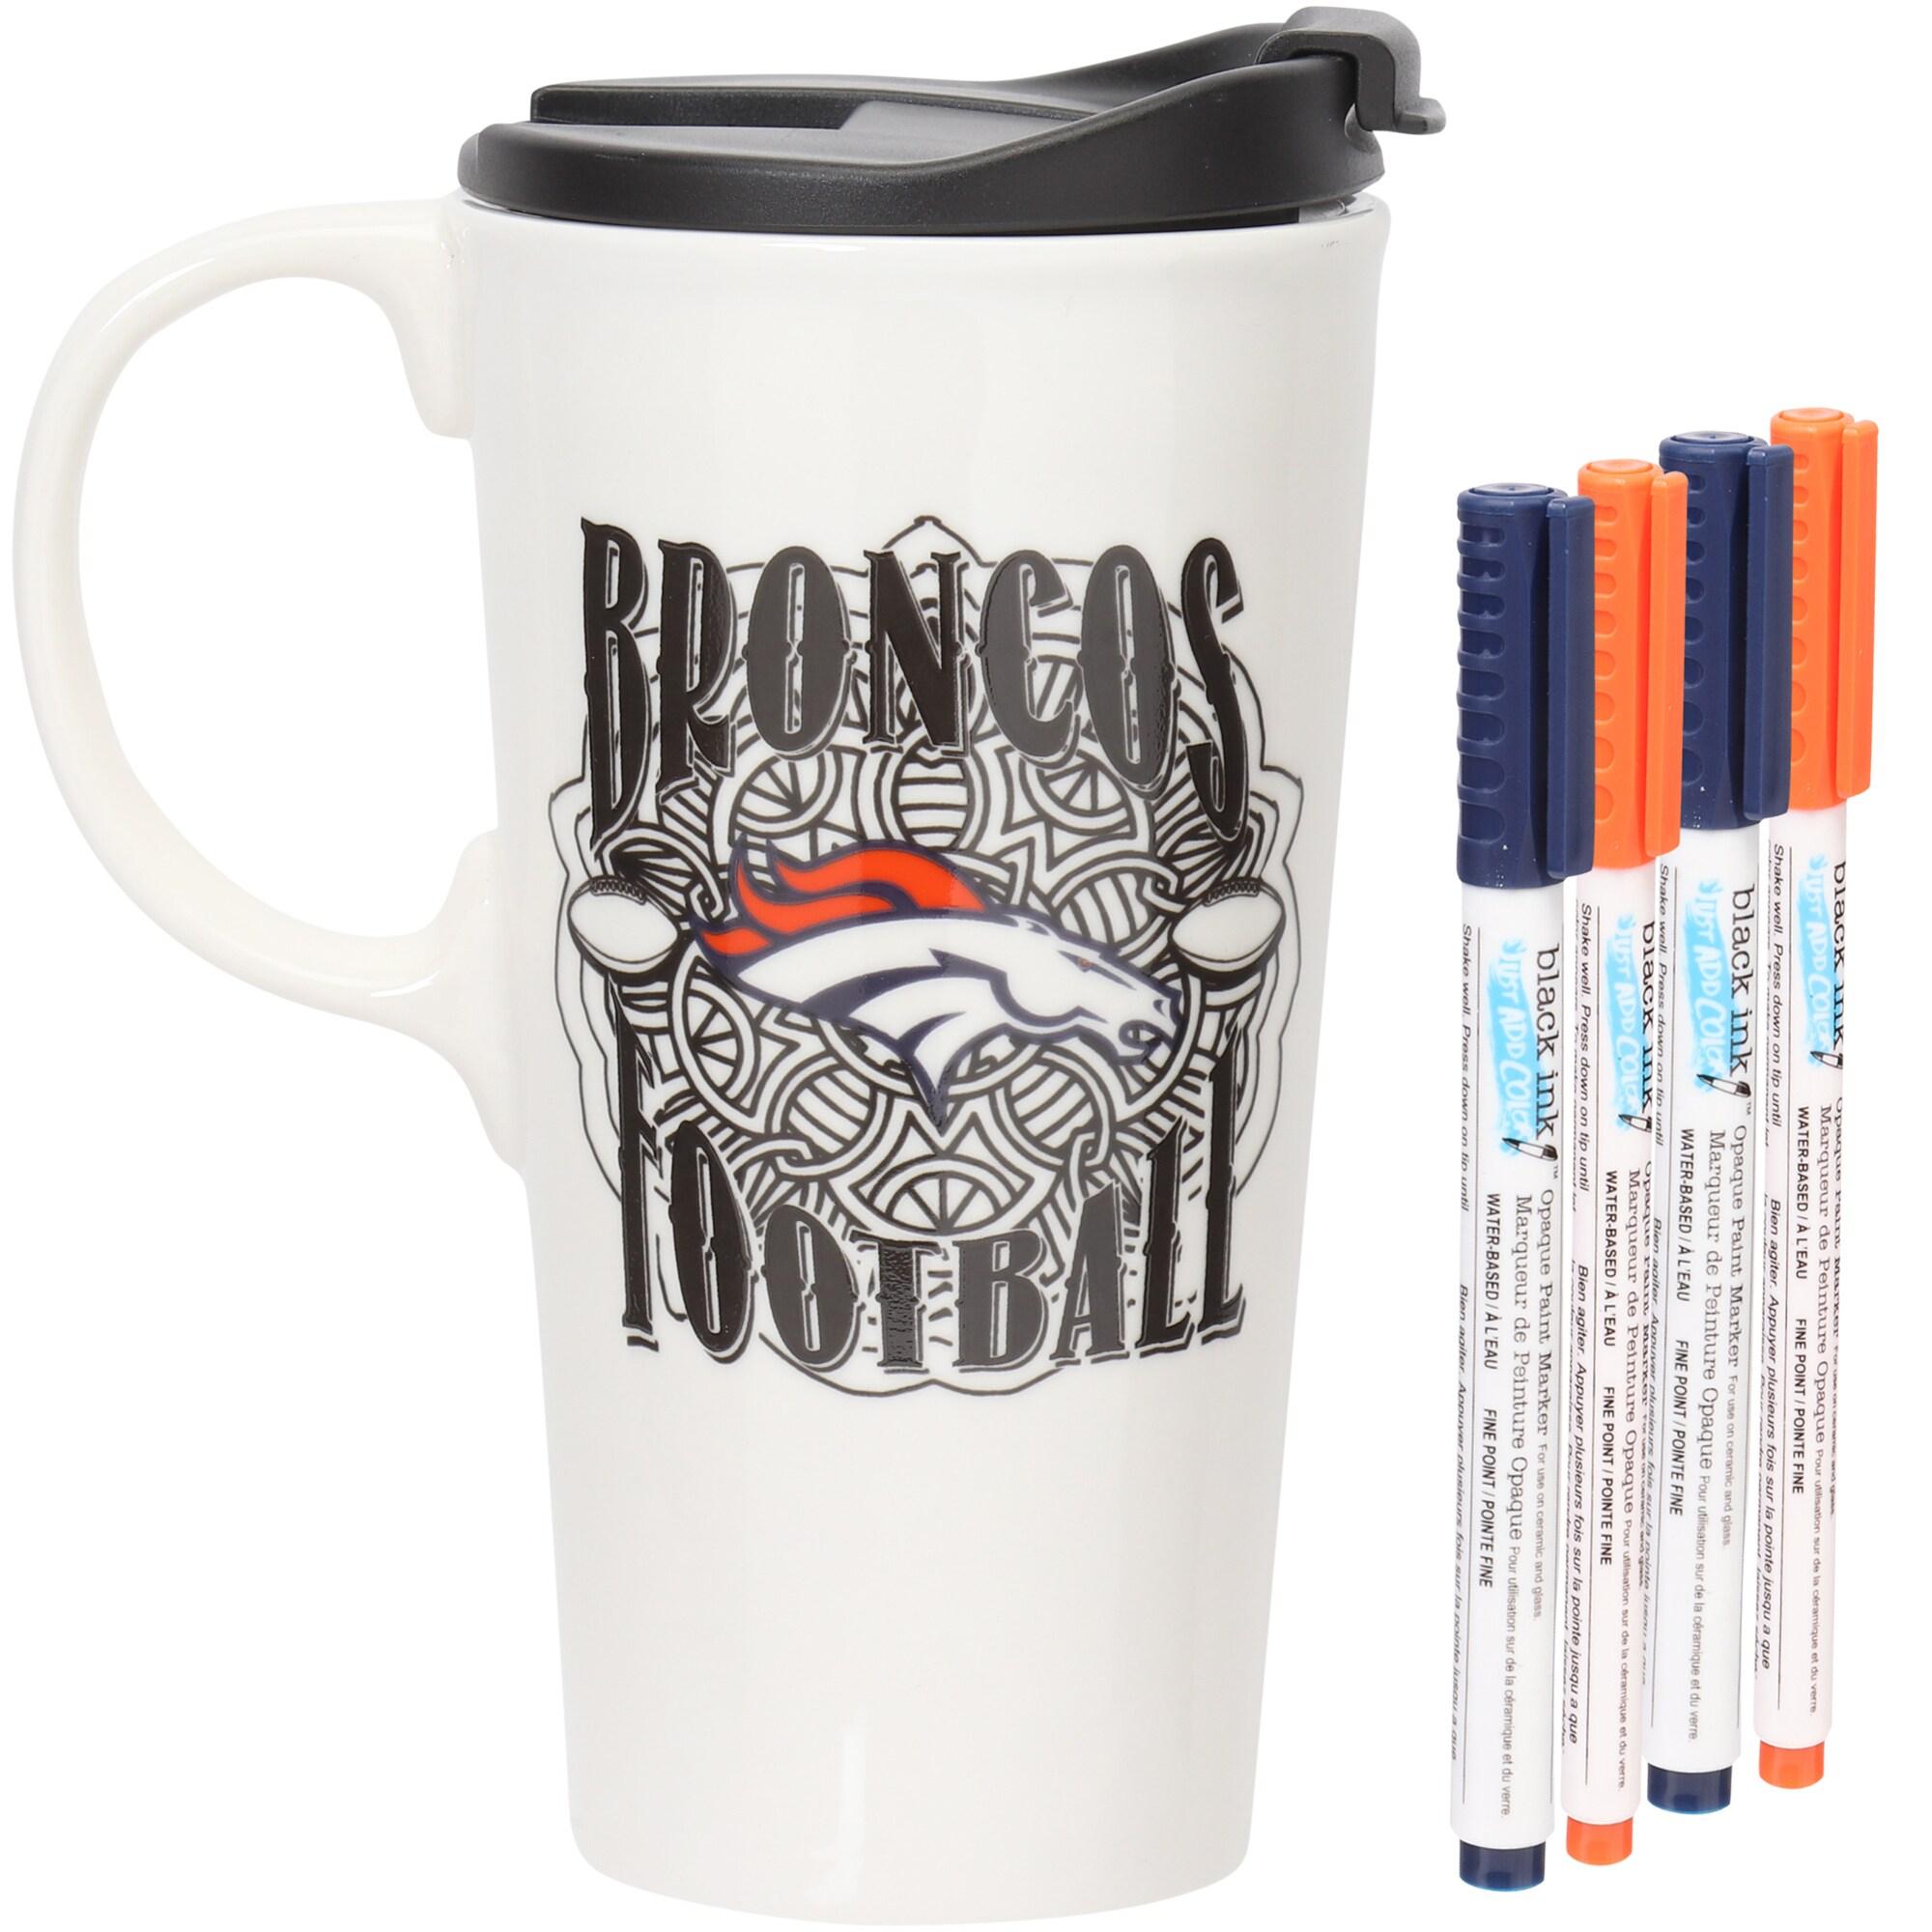 Denver Broncos 17oz. Just Add Color Perfect Cup